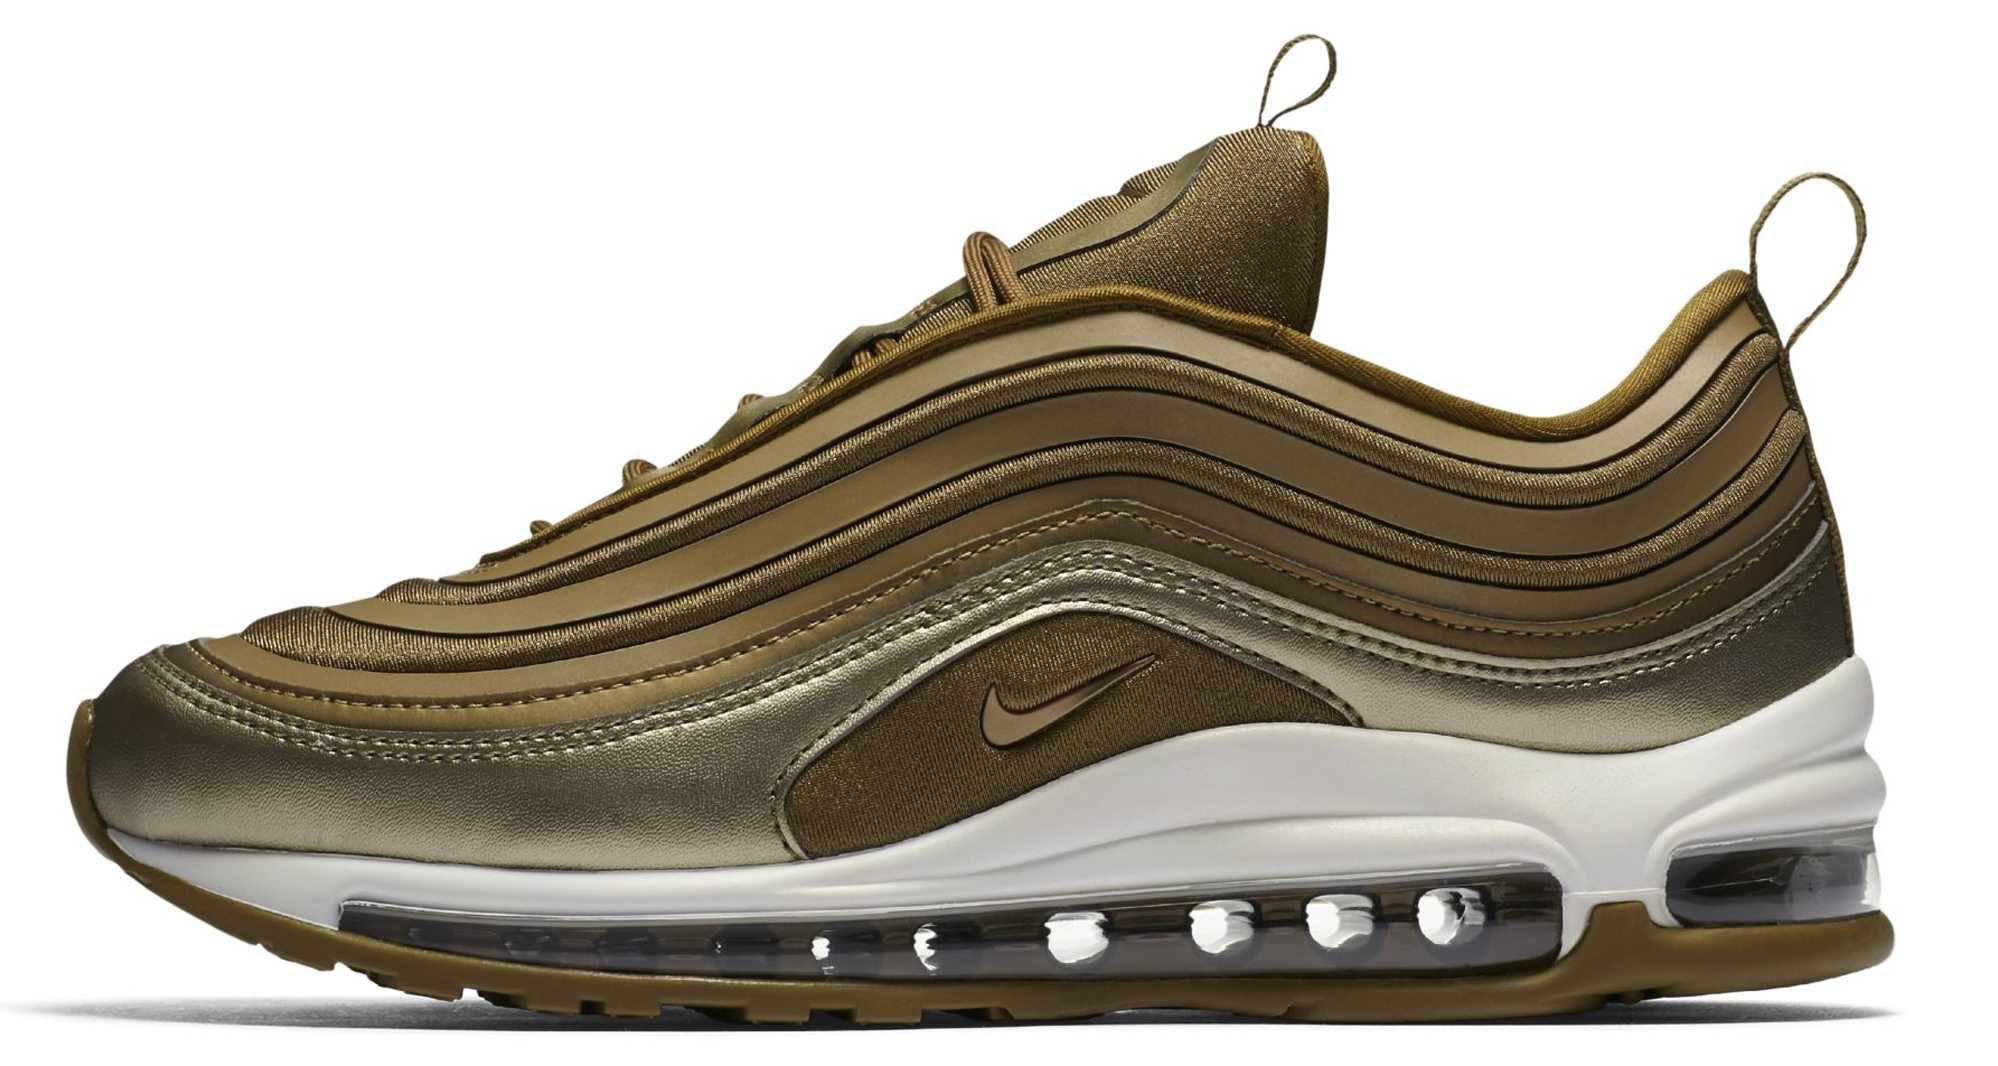 Nike Air Max 97 Ultra Metallic Gold 917704 901